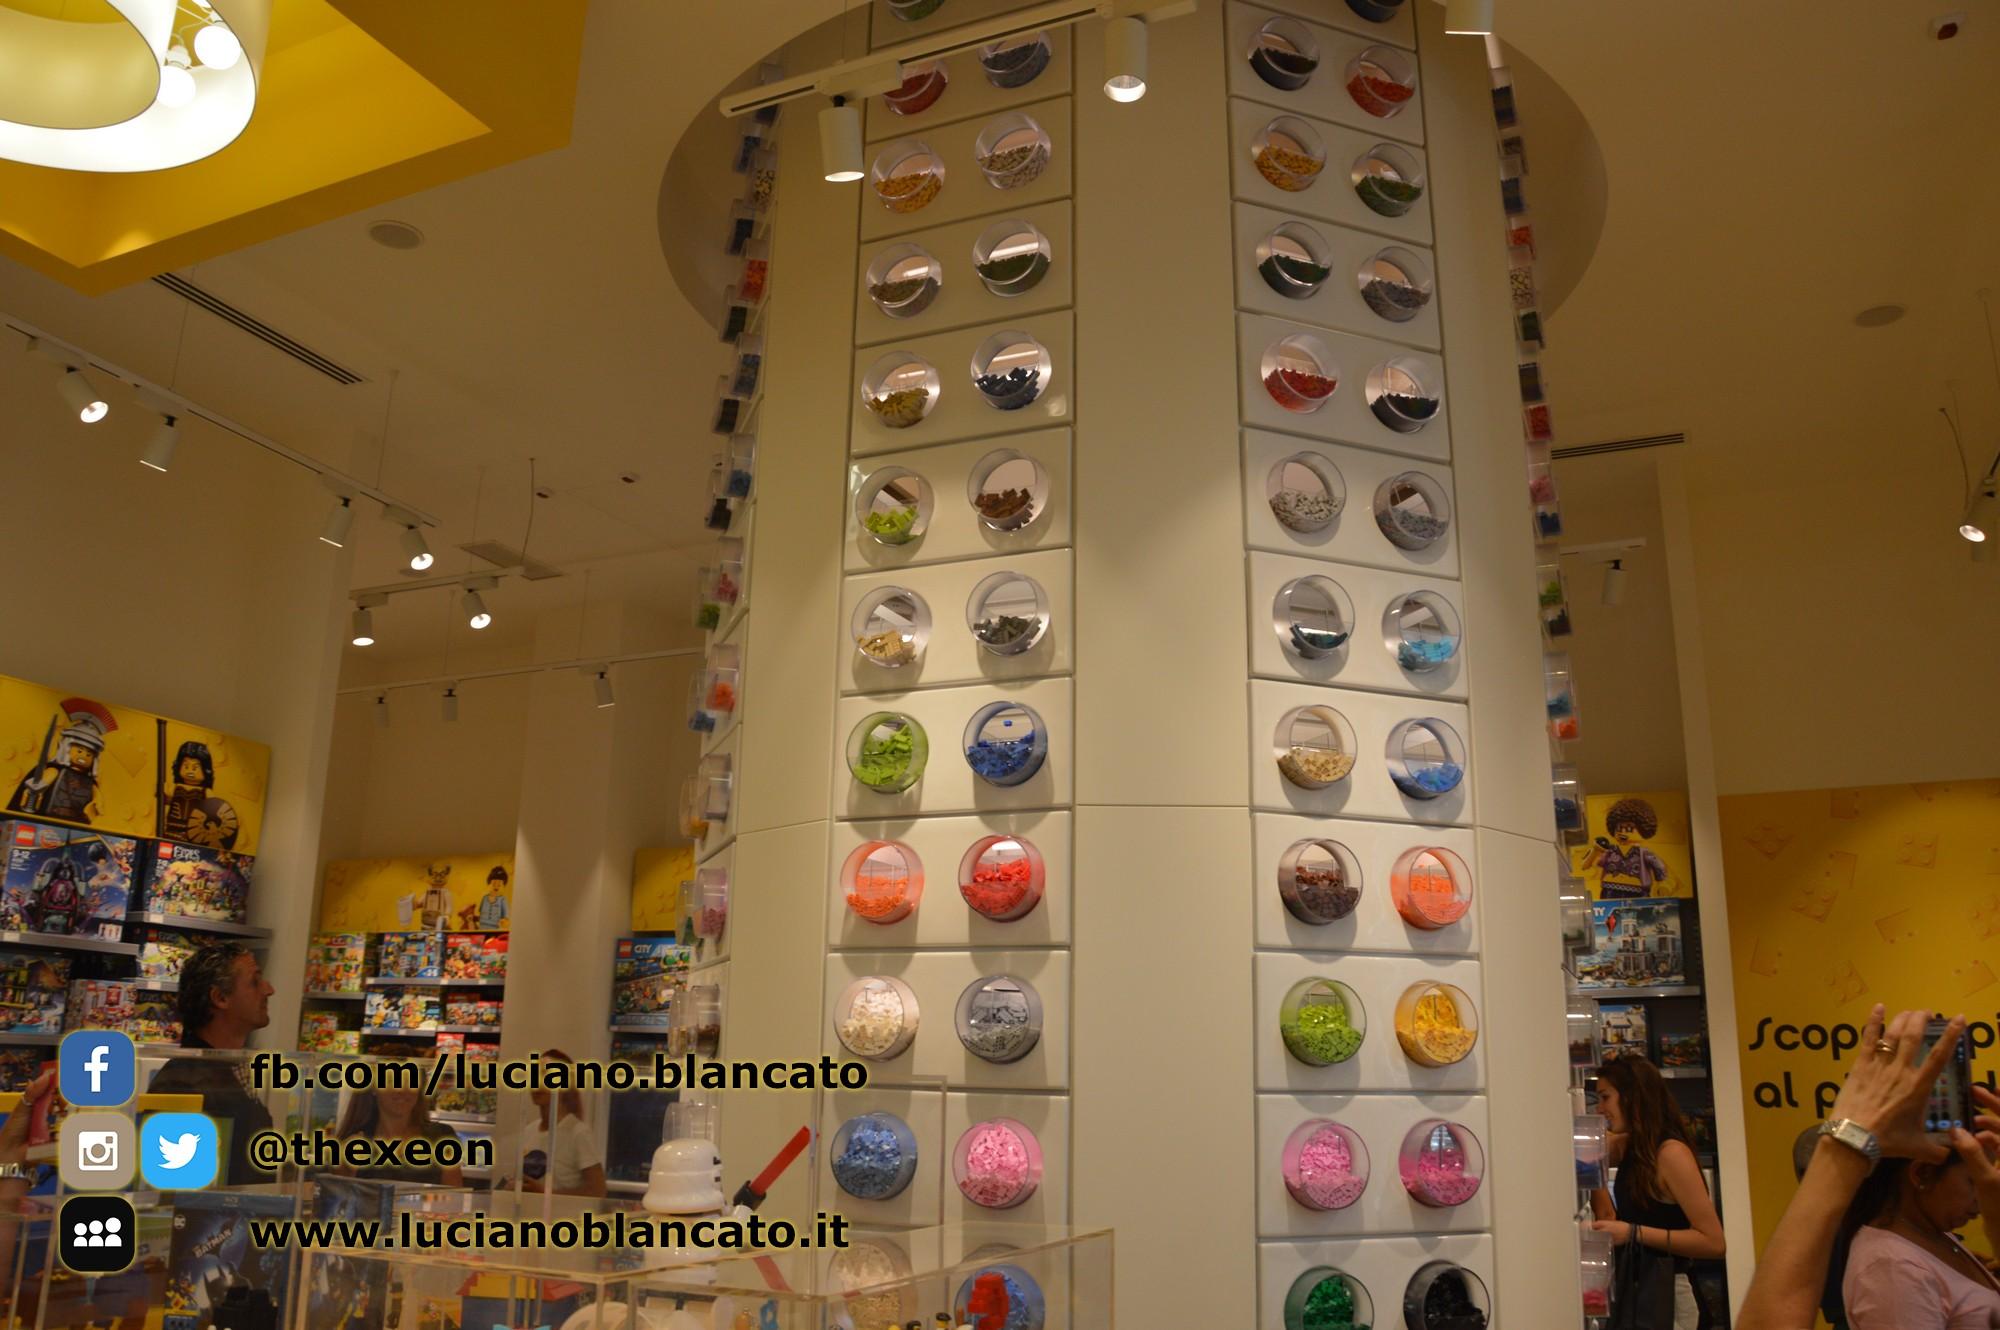 copy_1_Milano - Lego Store - Piazza San Babila